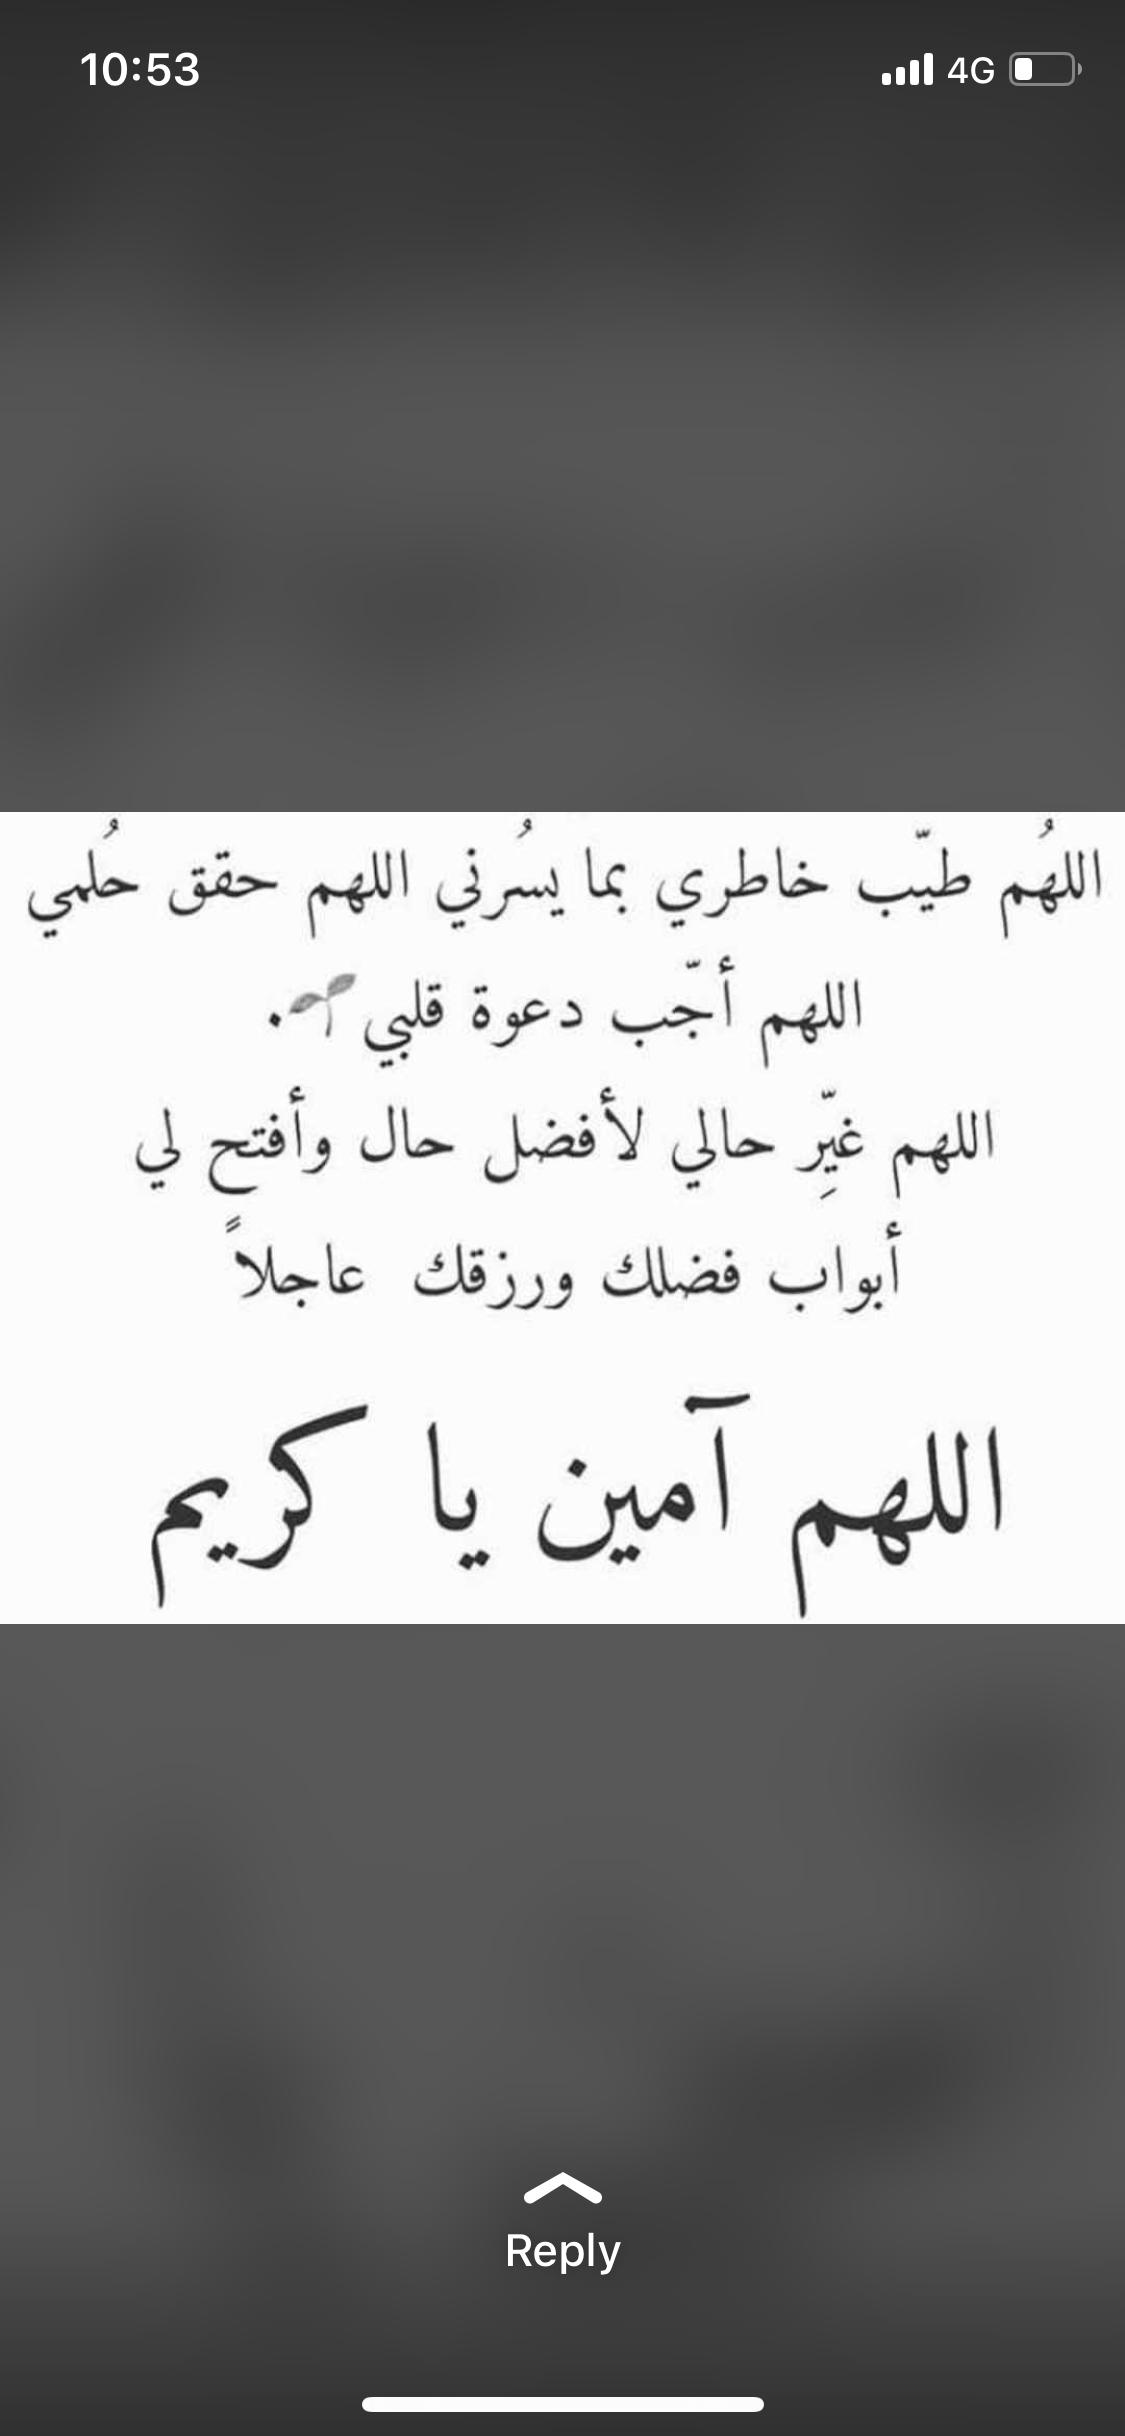 Pin By Ran Saleh On أدعية جميلة Arabic Calligraphy Calligraphy